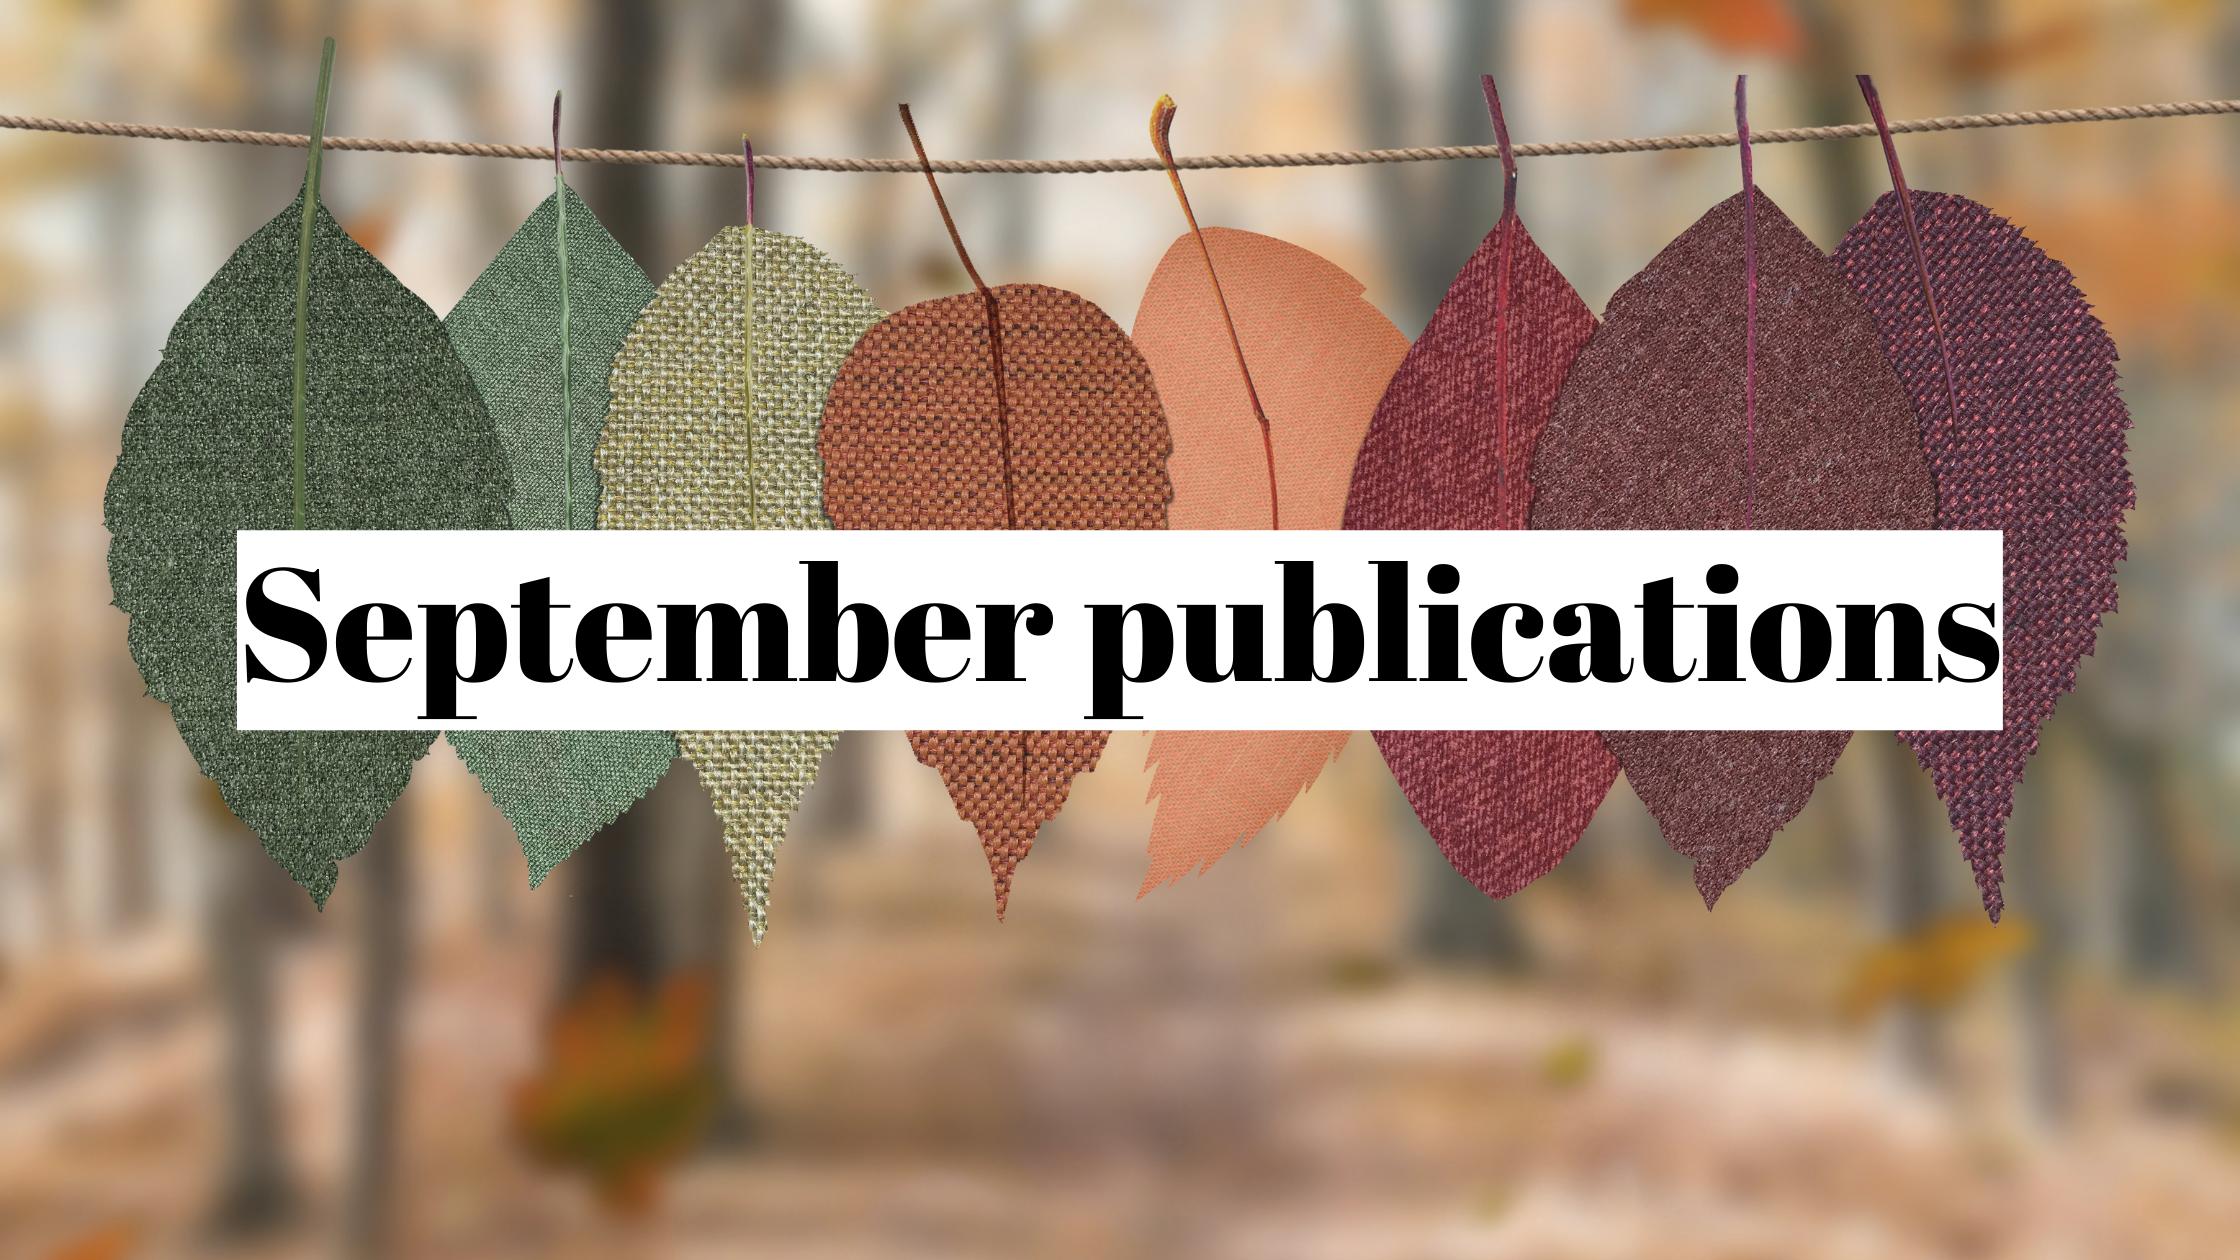 Truesix's September publicity harvest: BBC, Lifehack, Fast Mode, and more